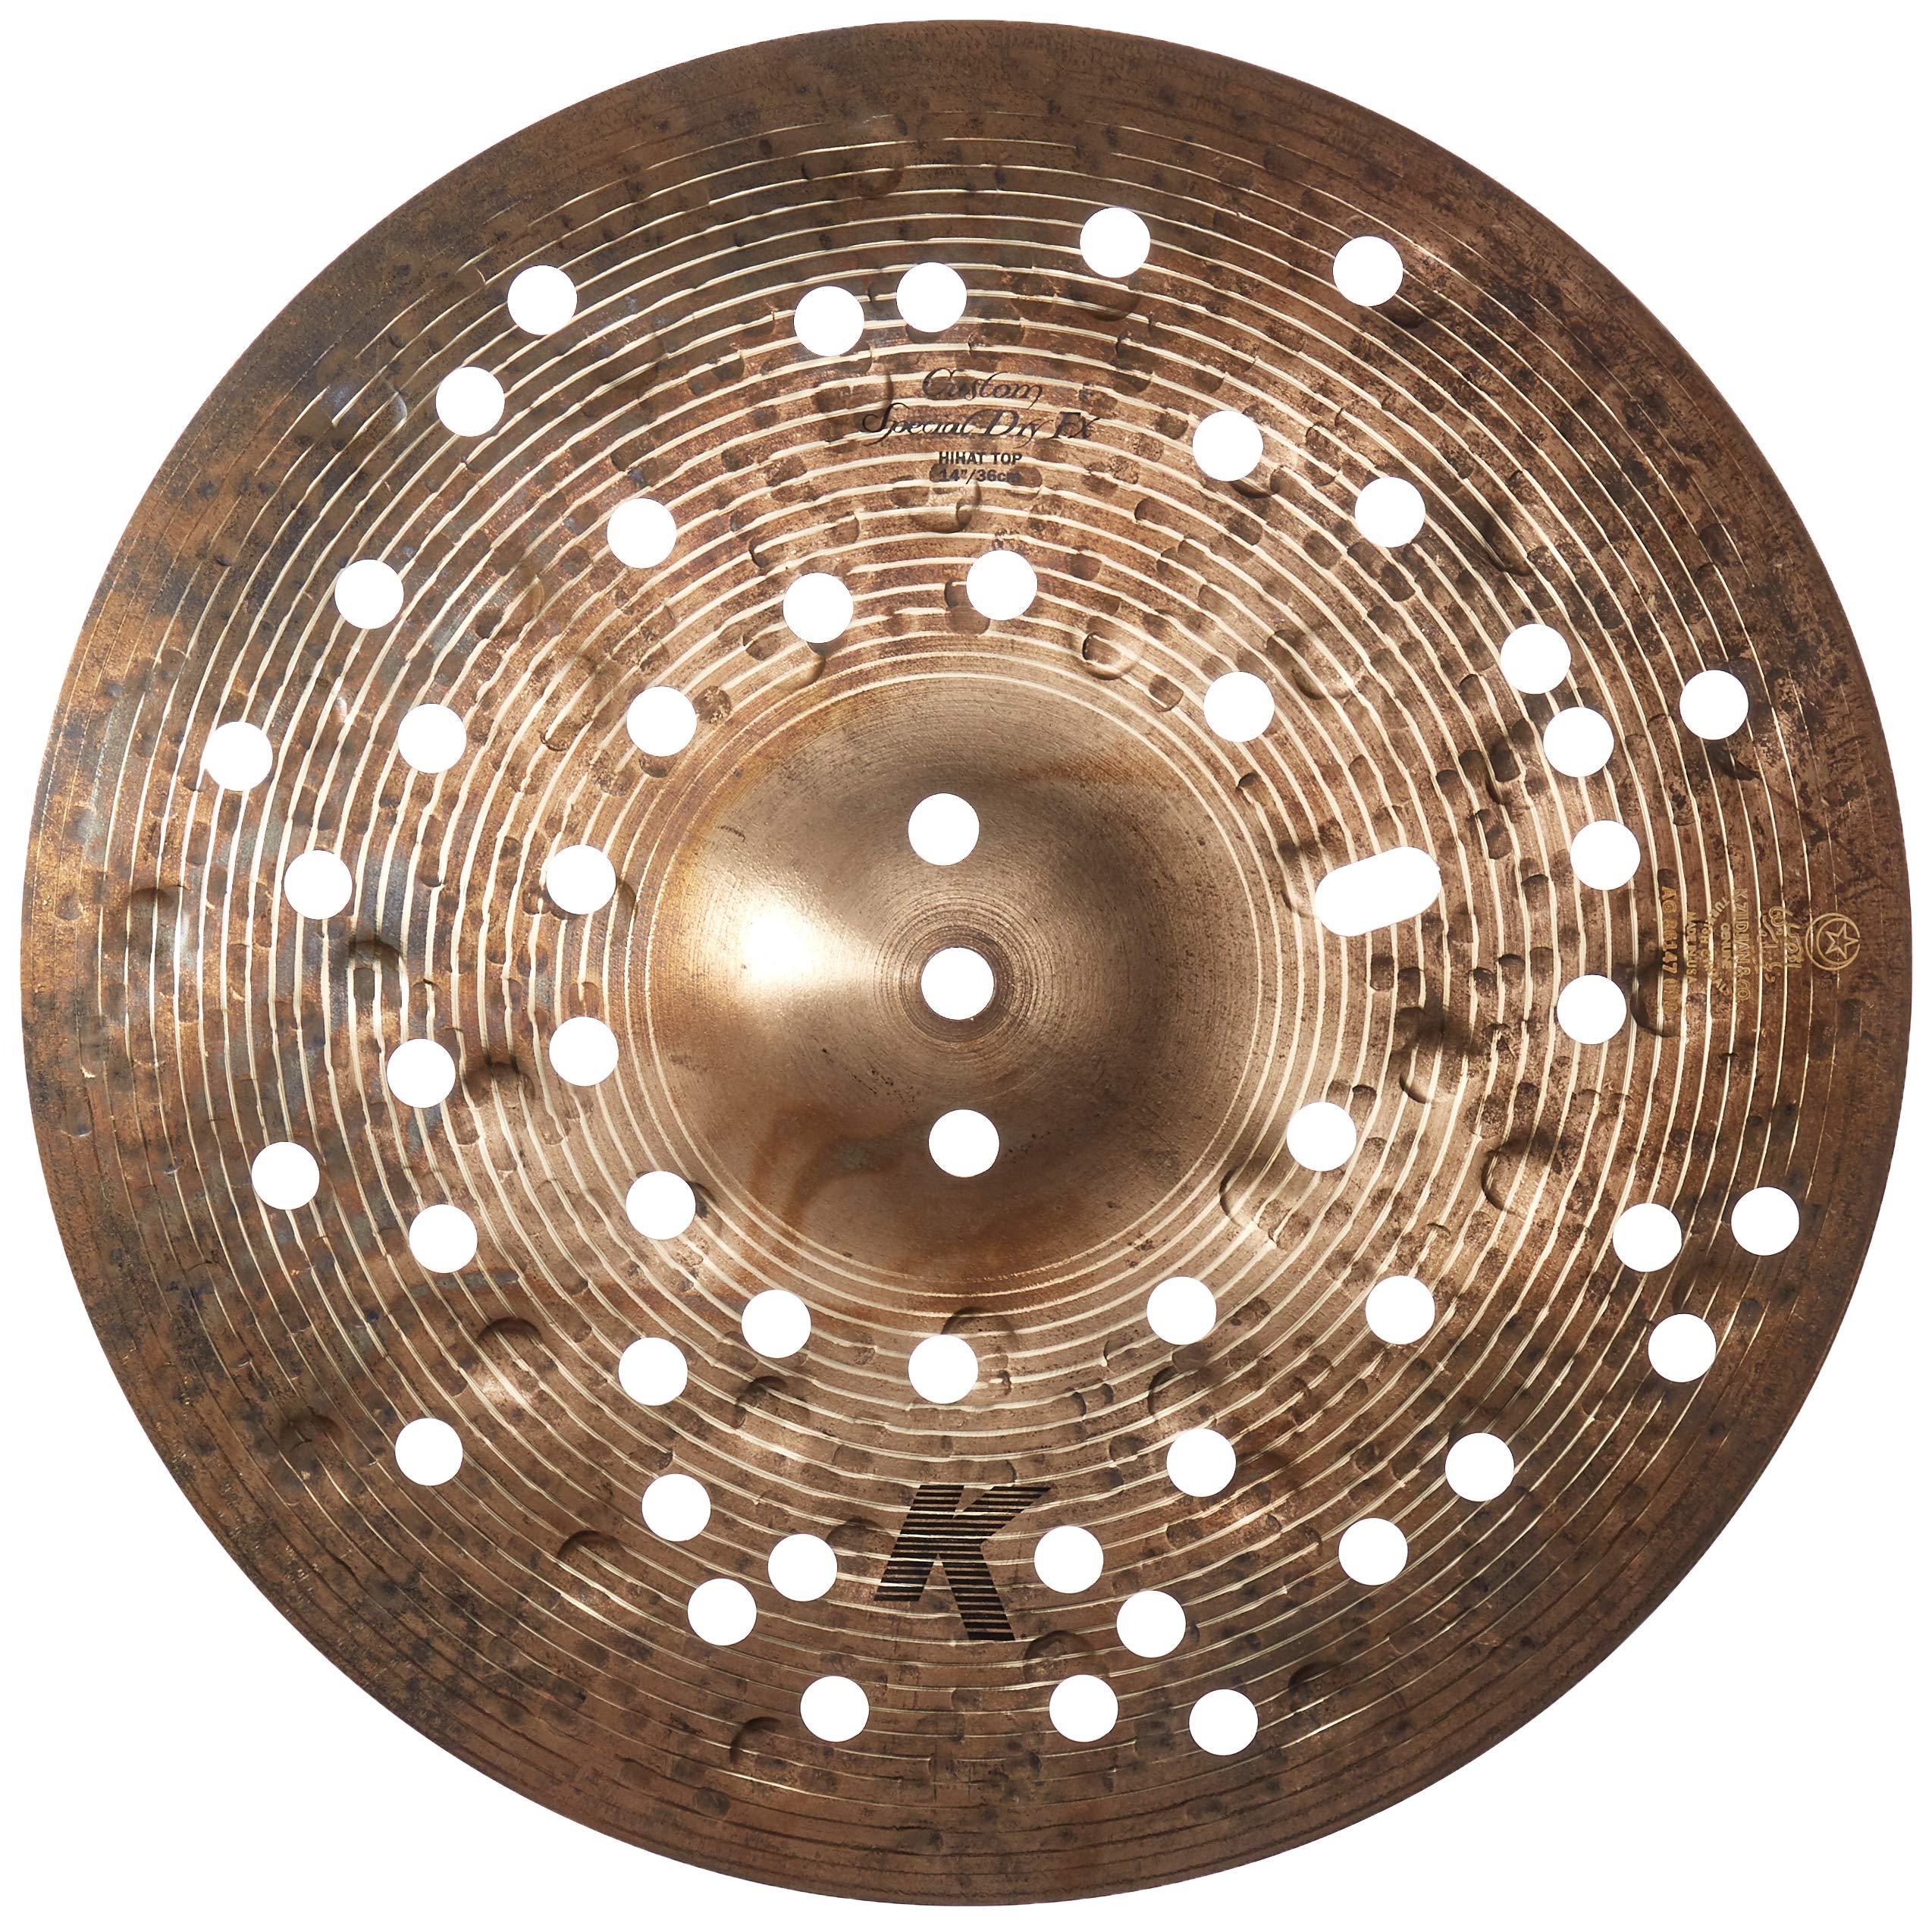 Zildjian K Custom Special Dry 14'' FX Hi Hat Top Cymbal (K1411)